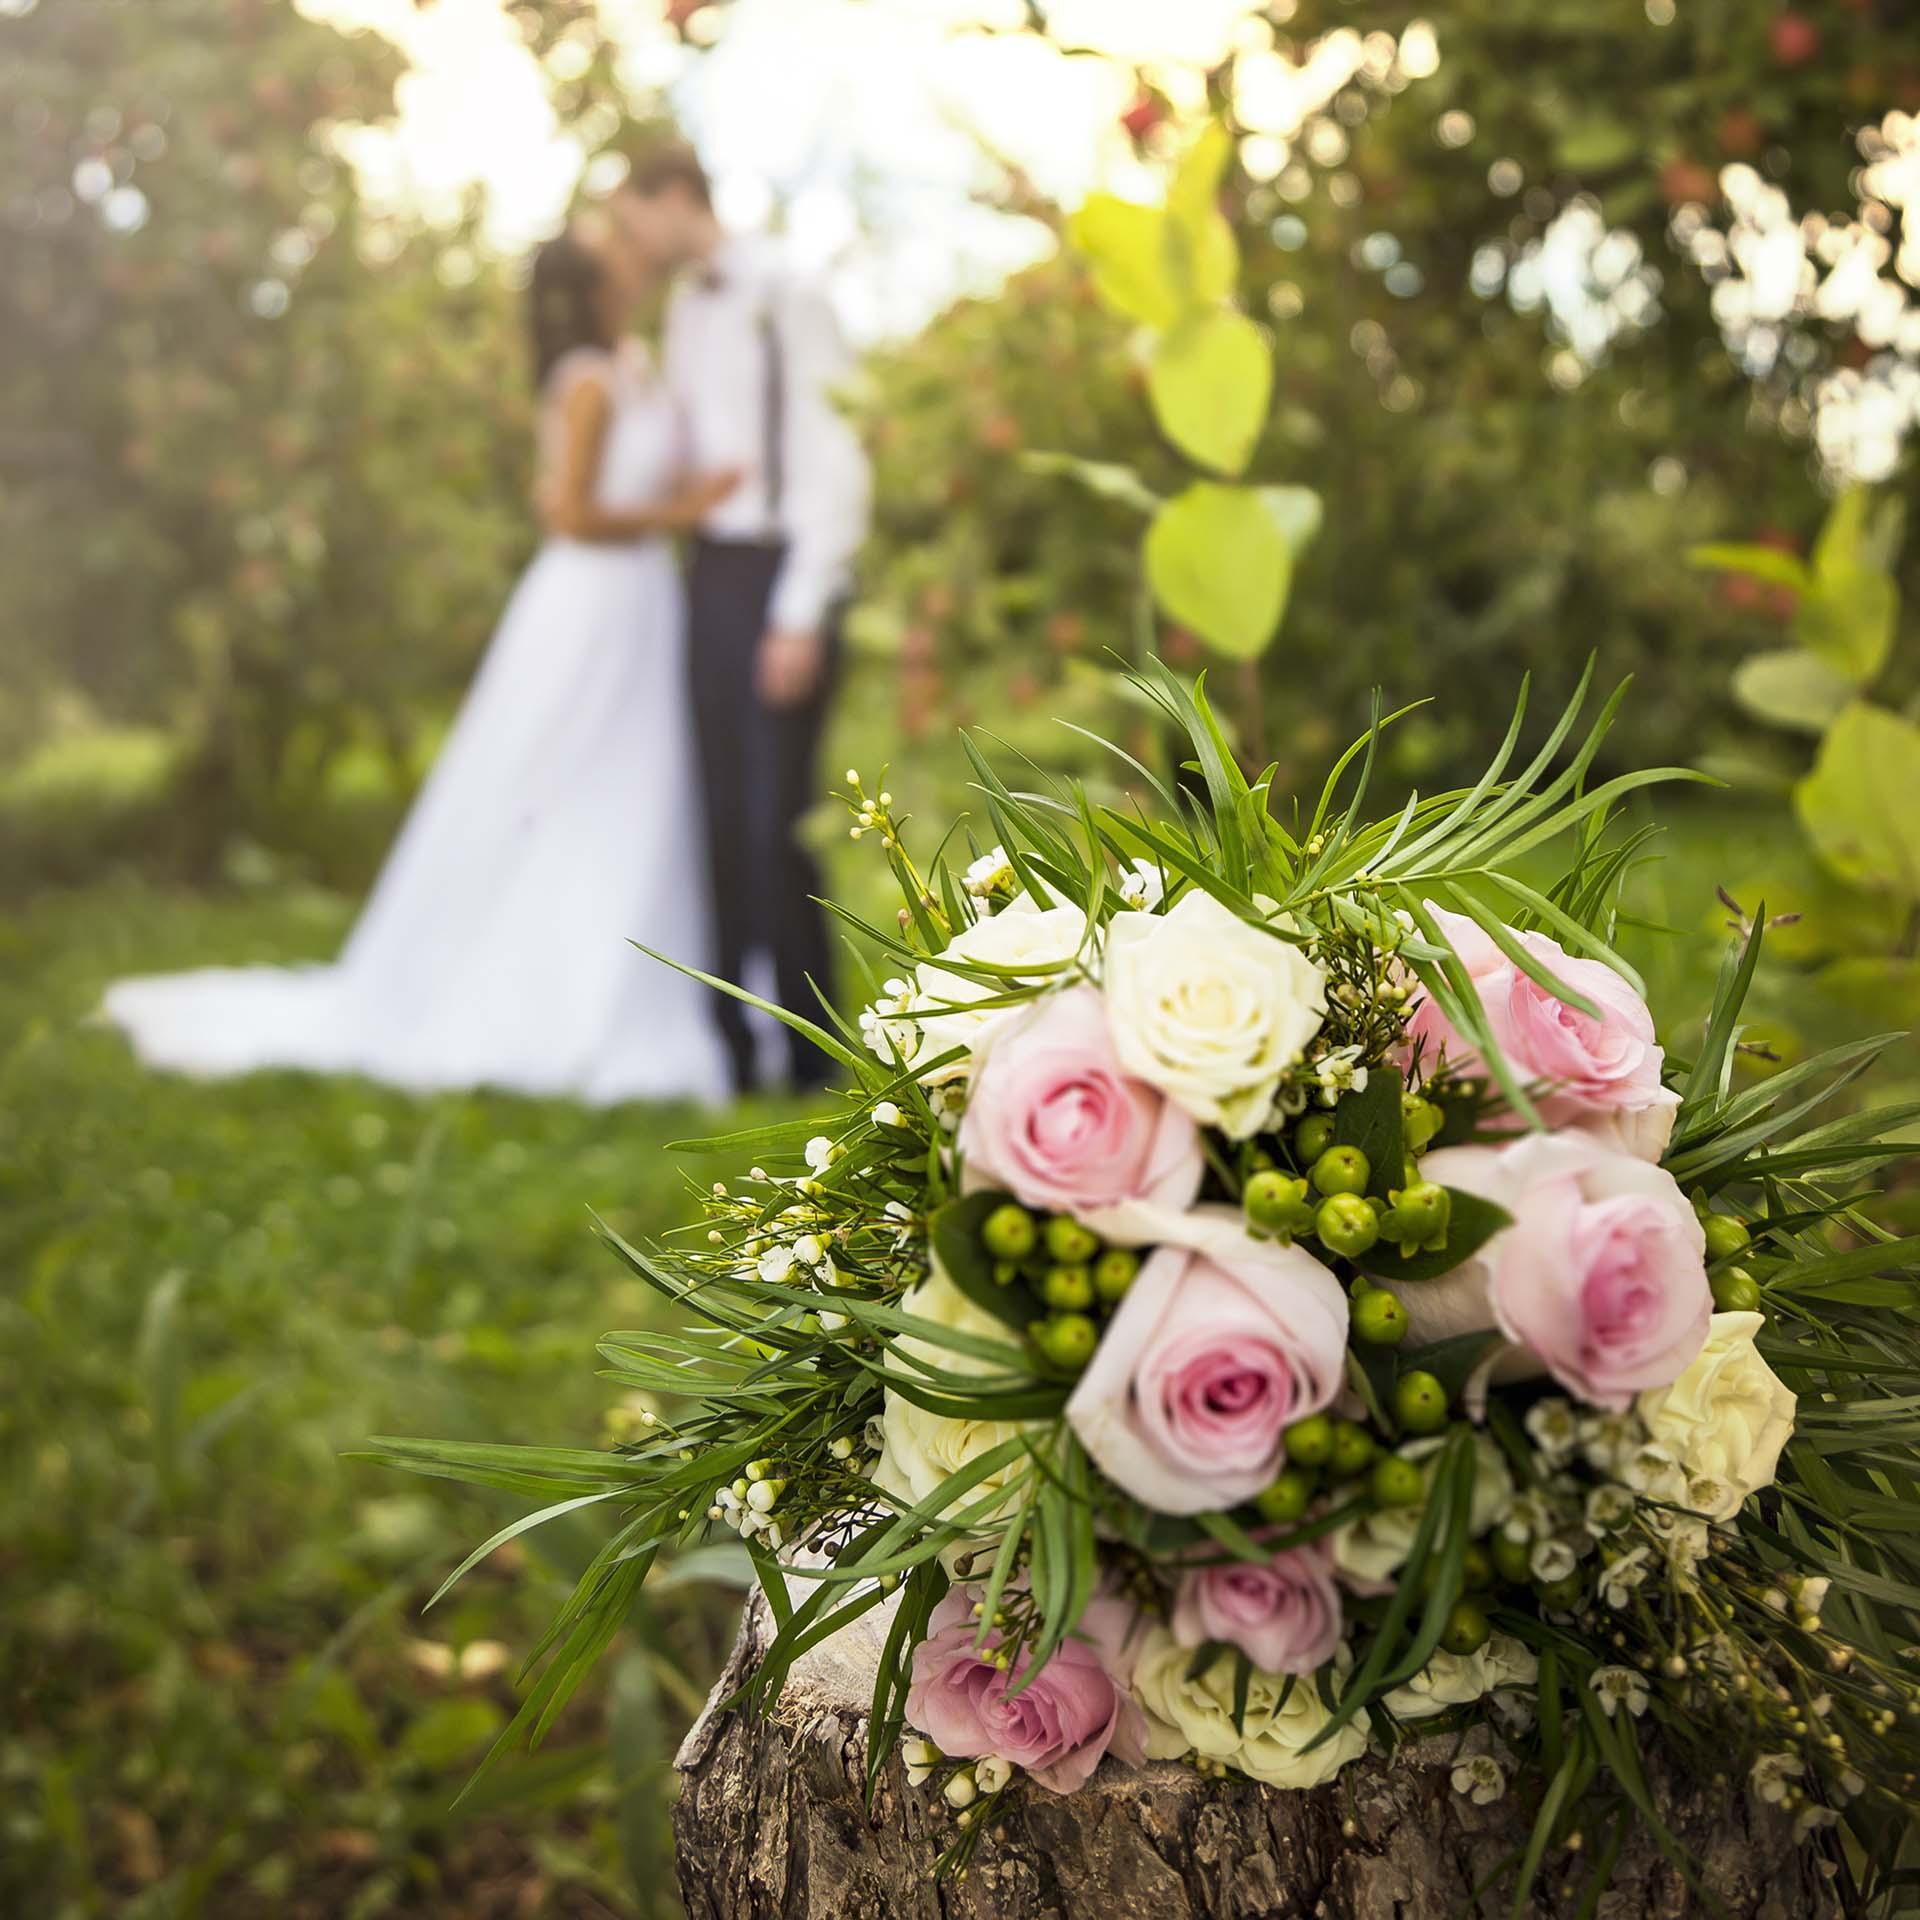 mariage-nature-bellaro-image-photographe-professionnel-photographe-photographer-retouche-artiste-retoucheur-high-end-retouching